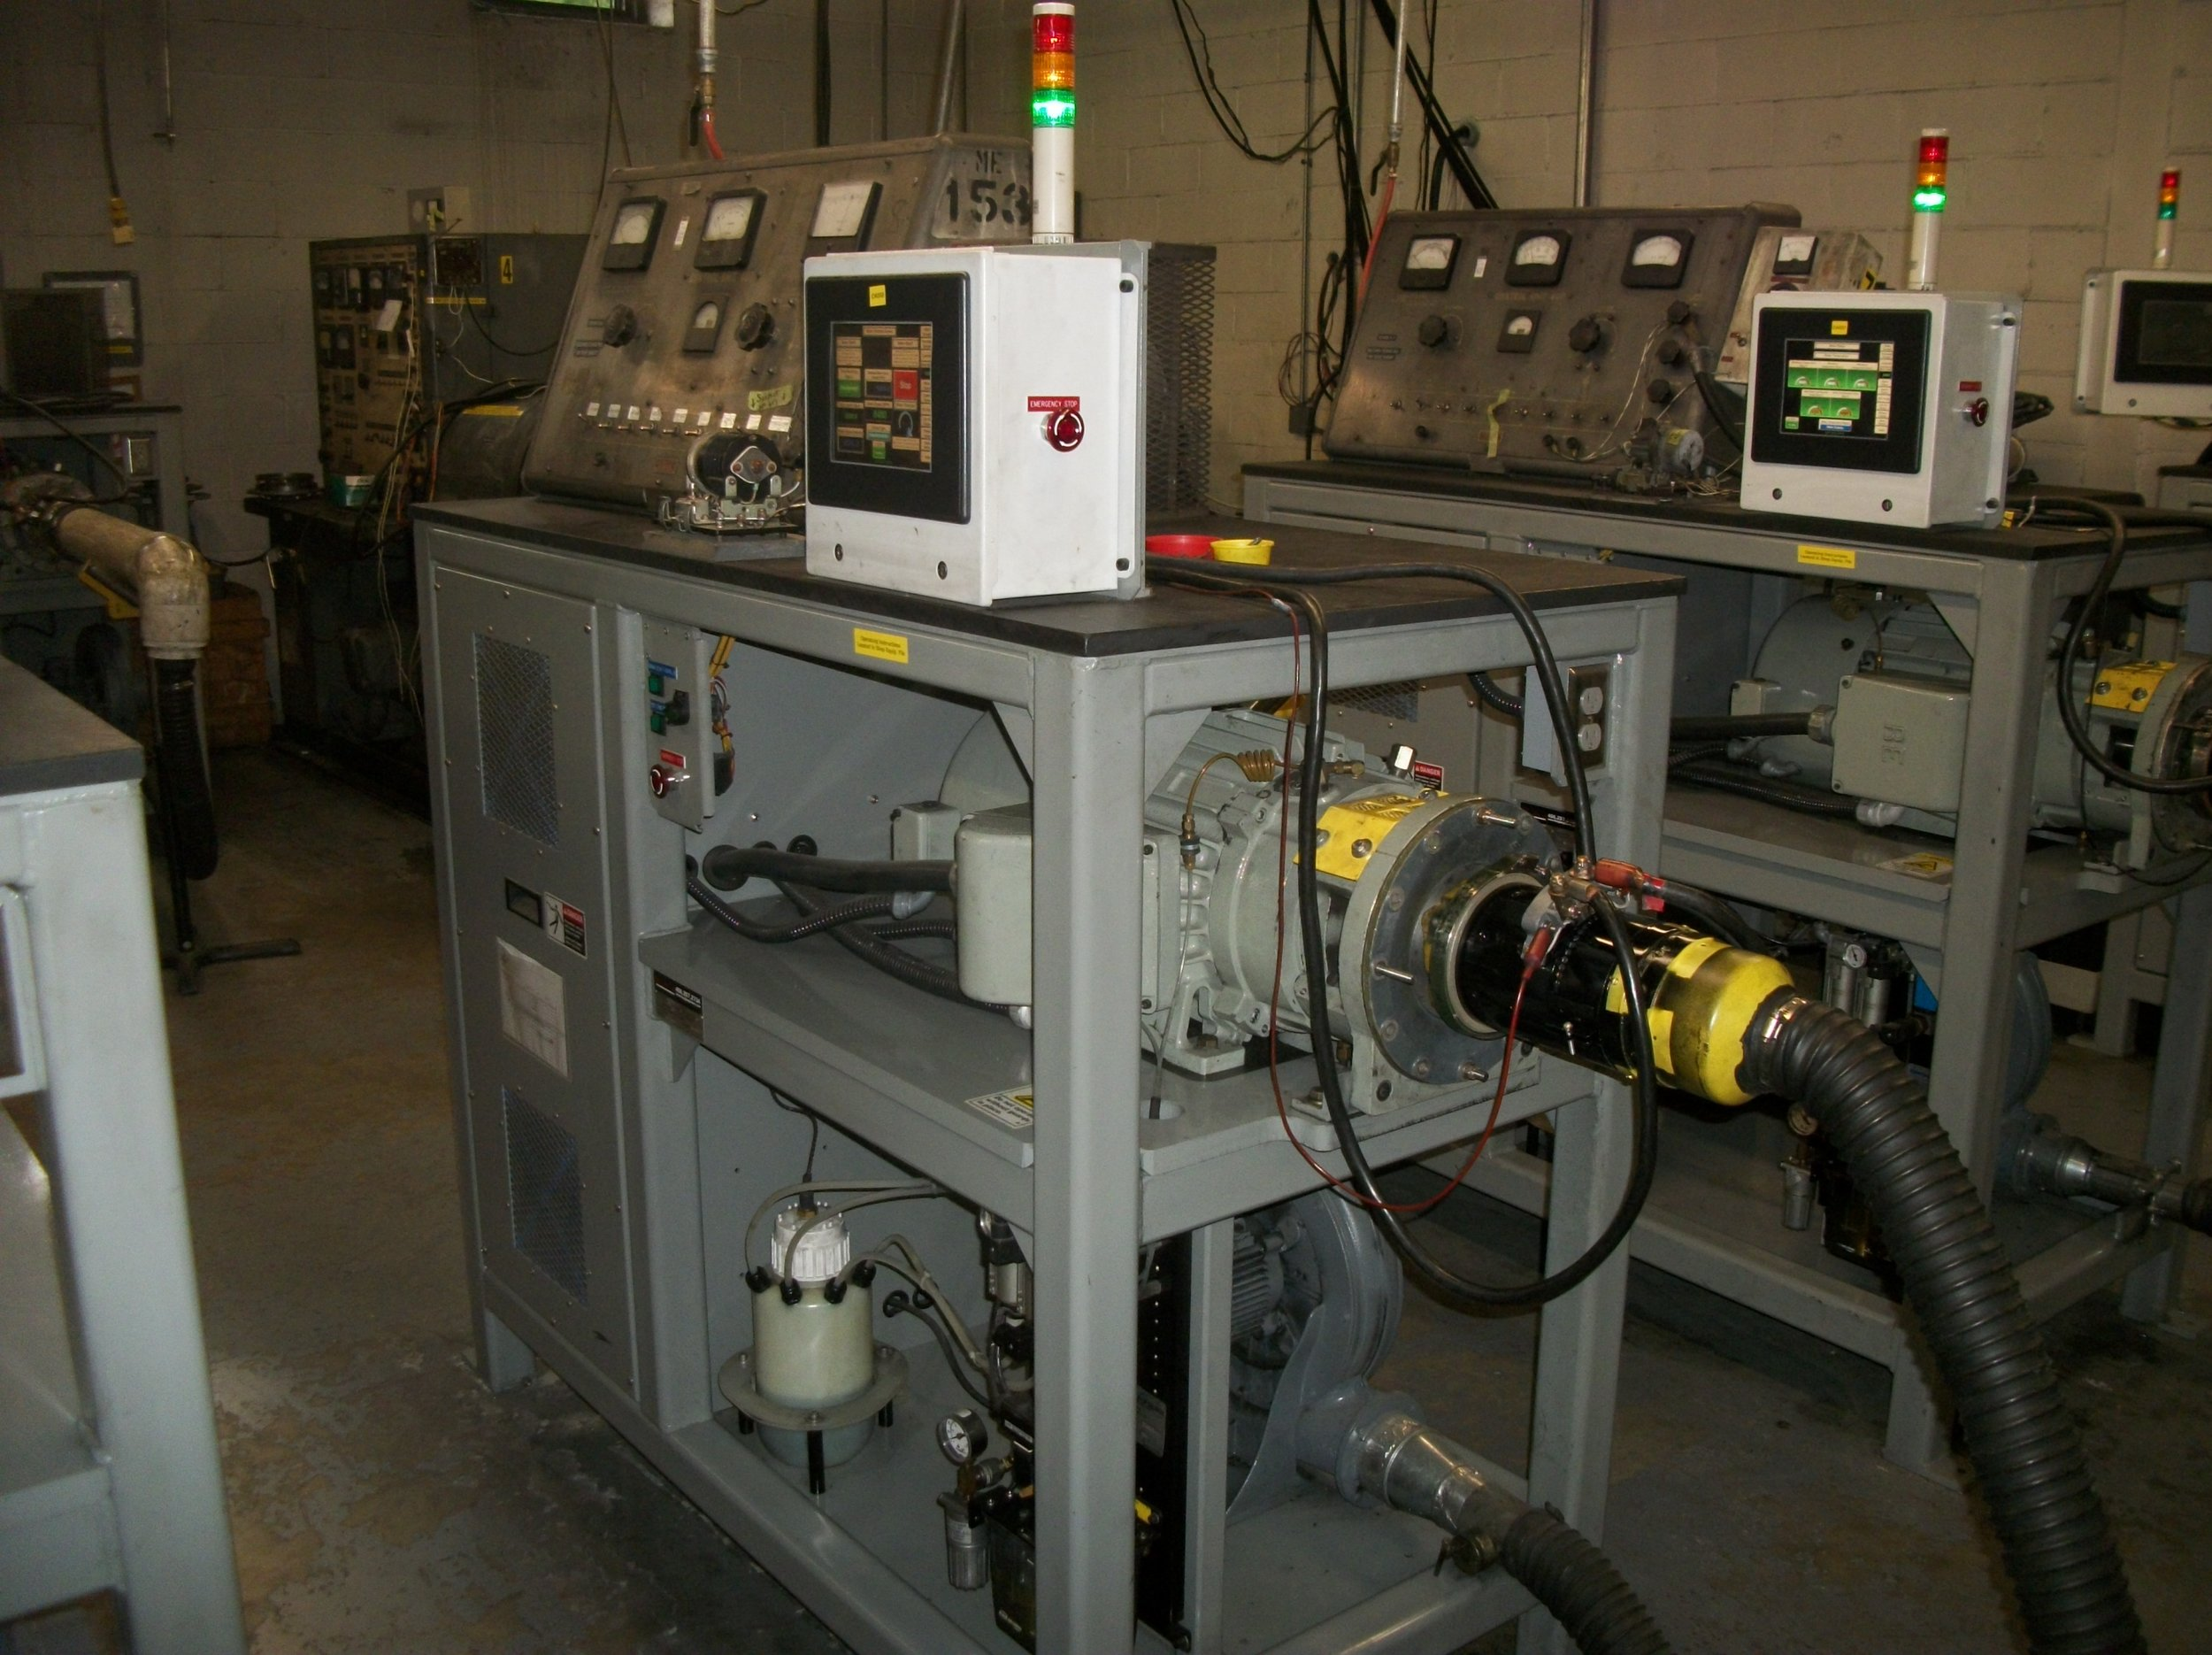 100_9917_TestStand_Generator-Test-Stand.JPG